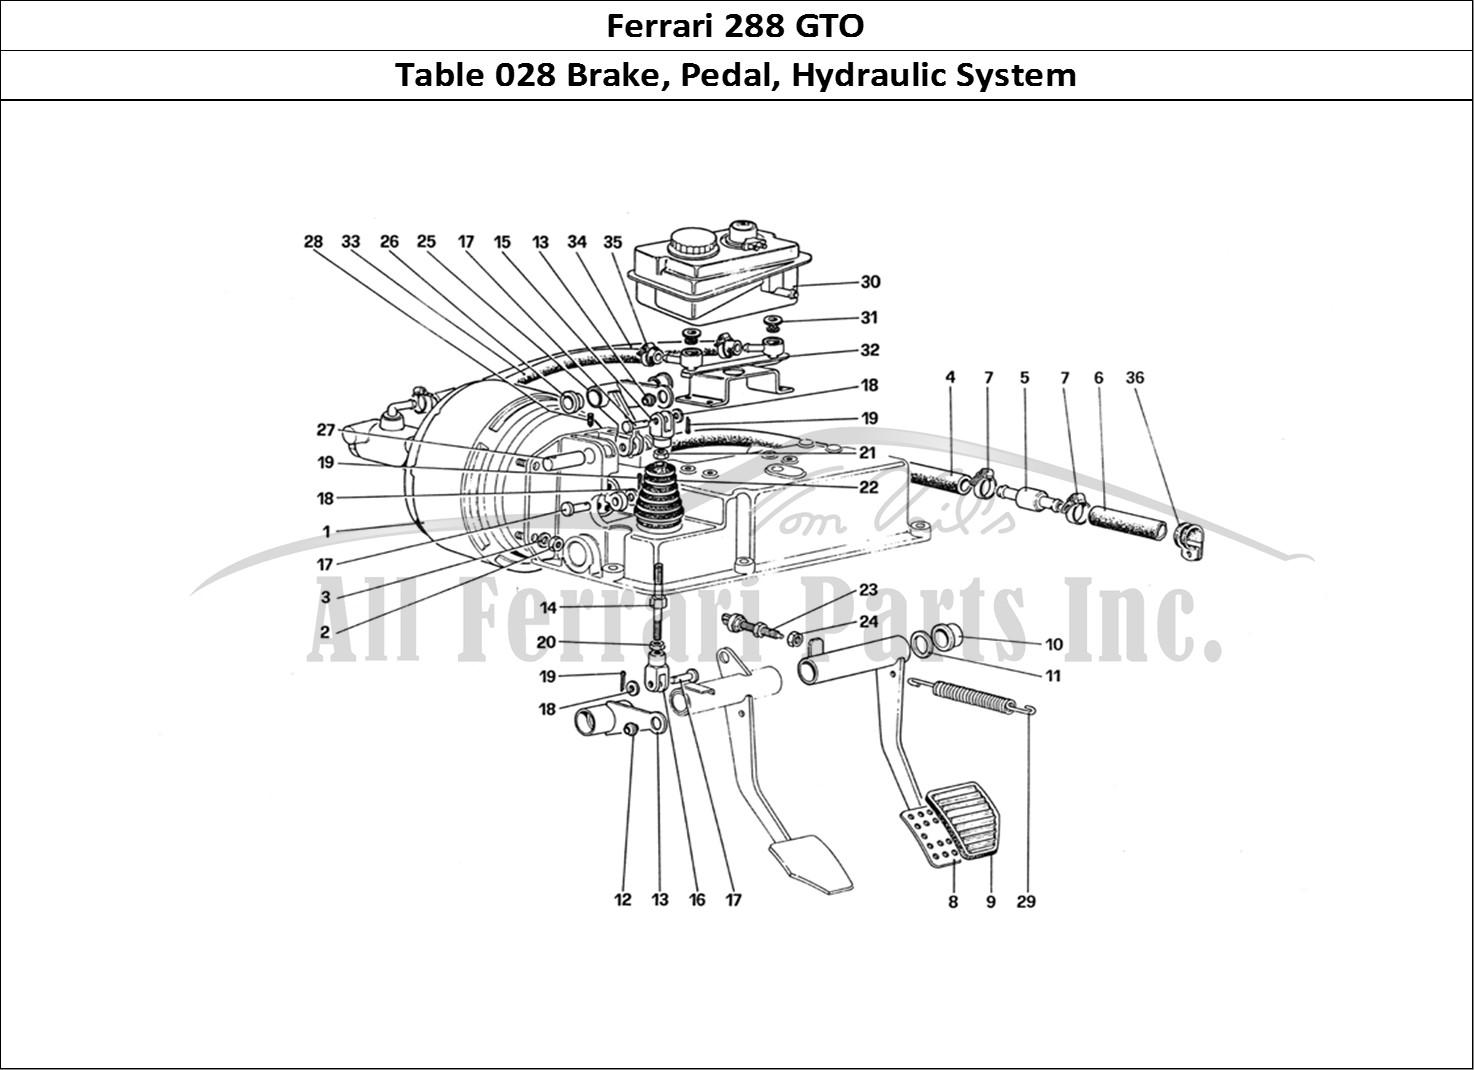 Buy original Ferrari 288 GTO 028 Brake, Pedal, Hydraulic